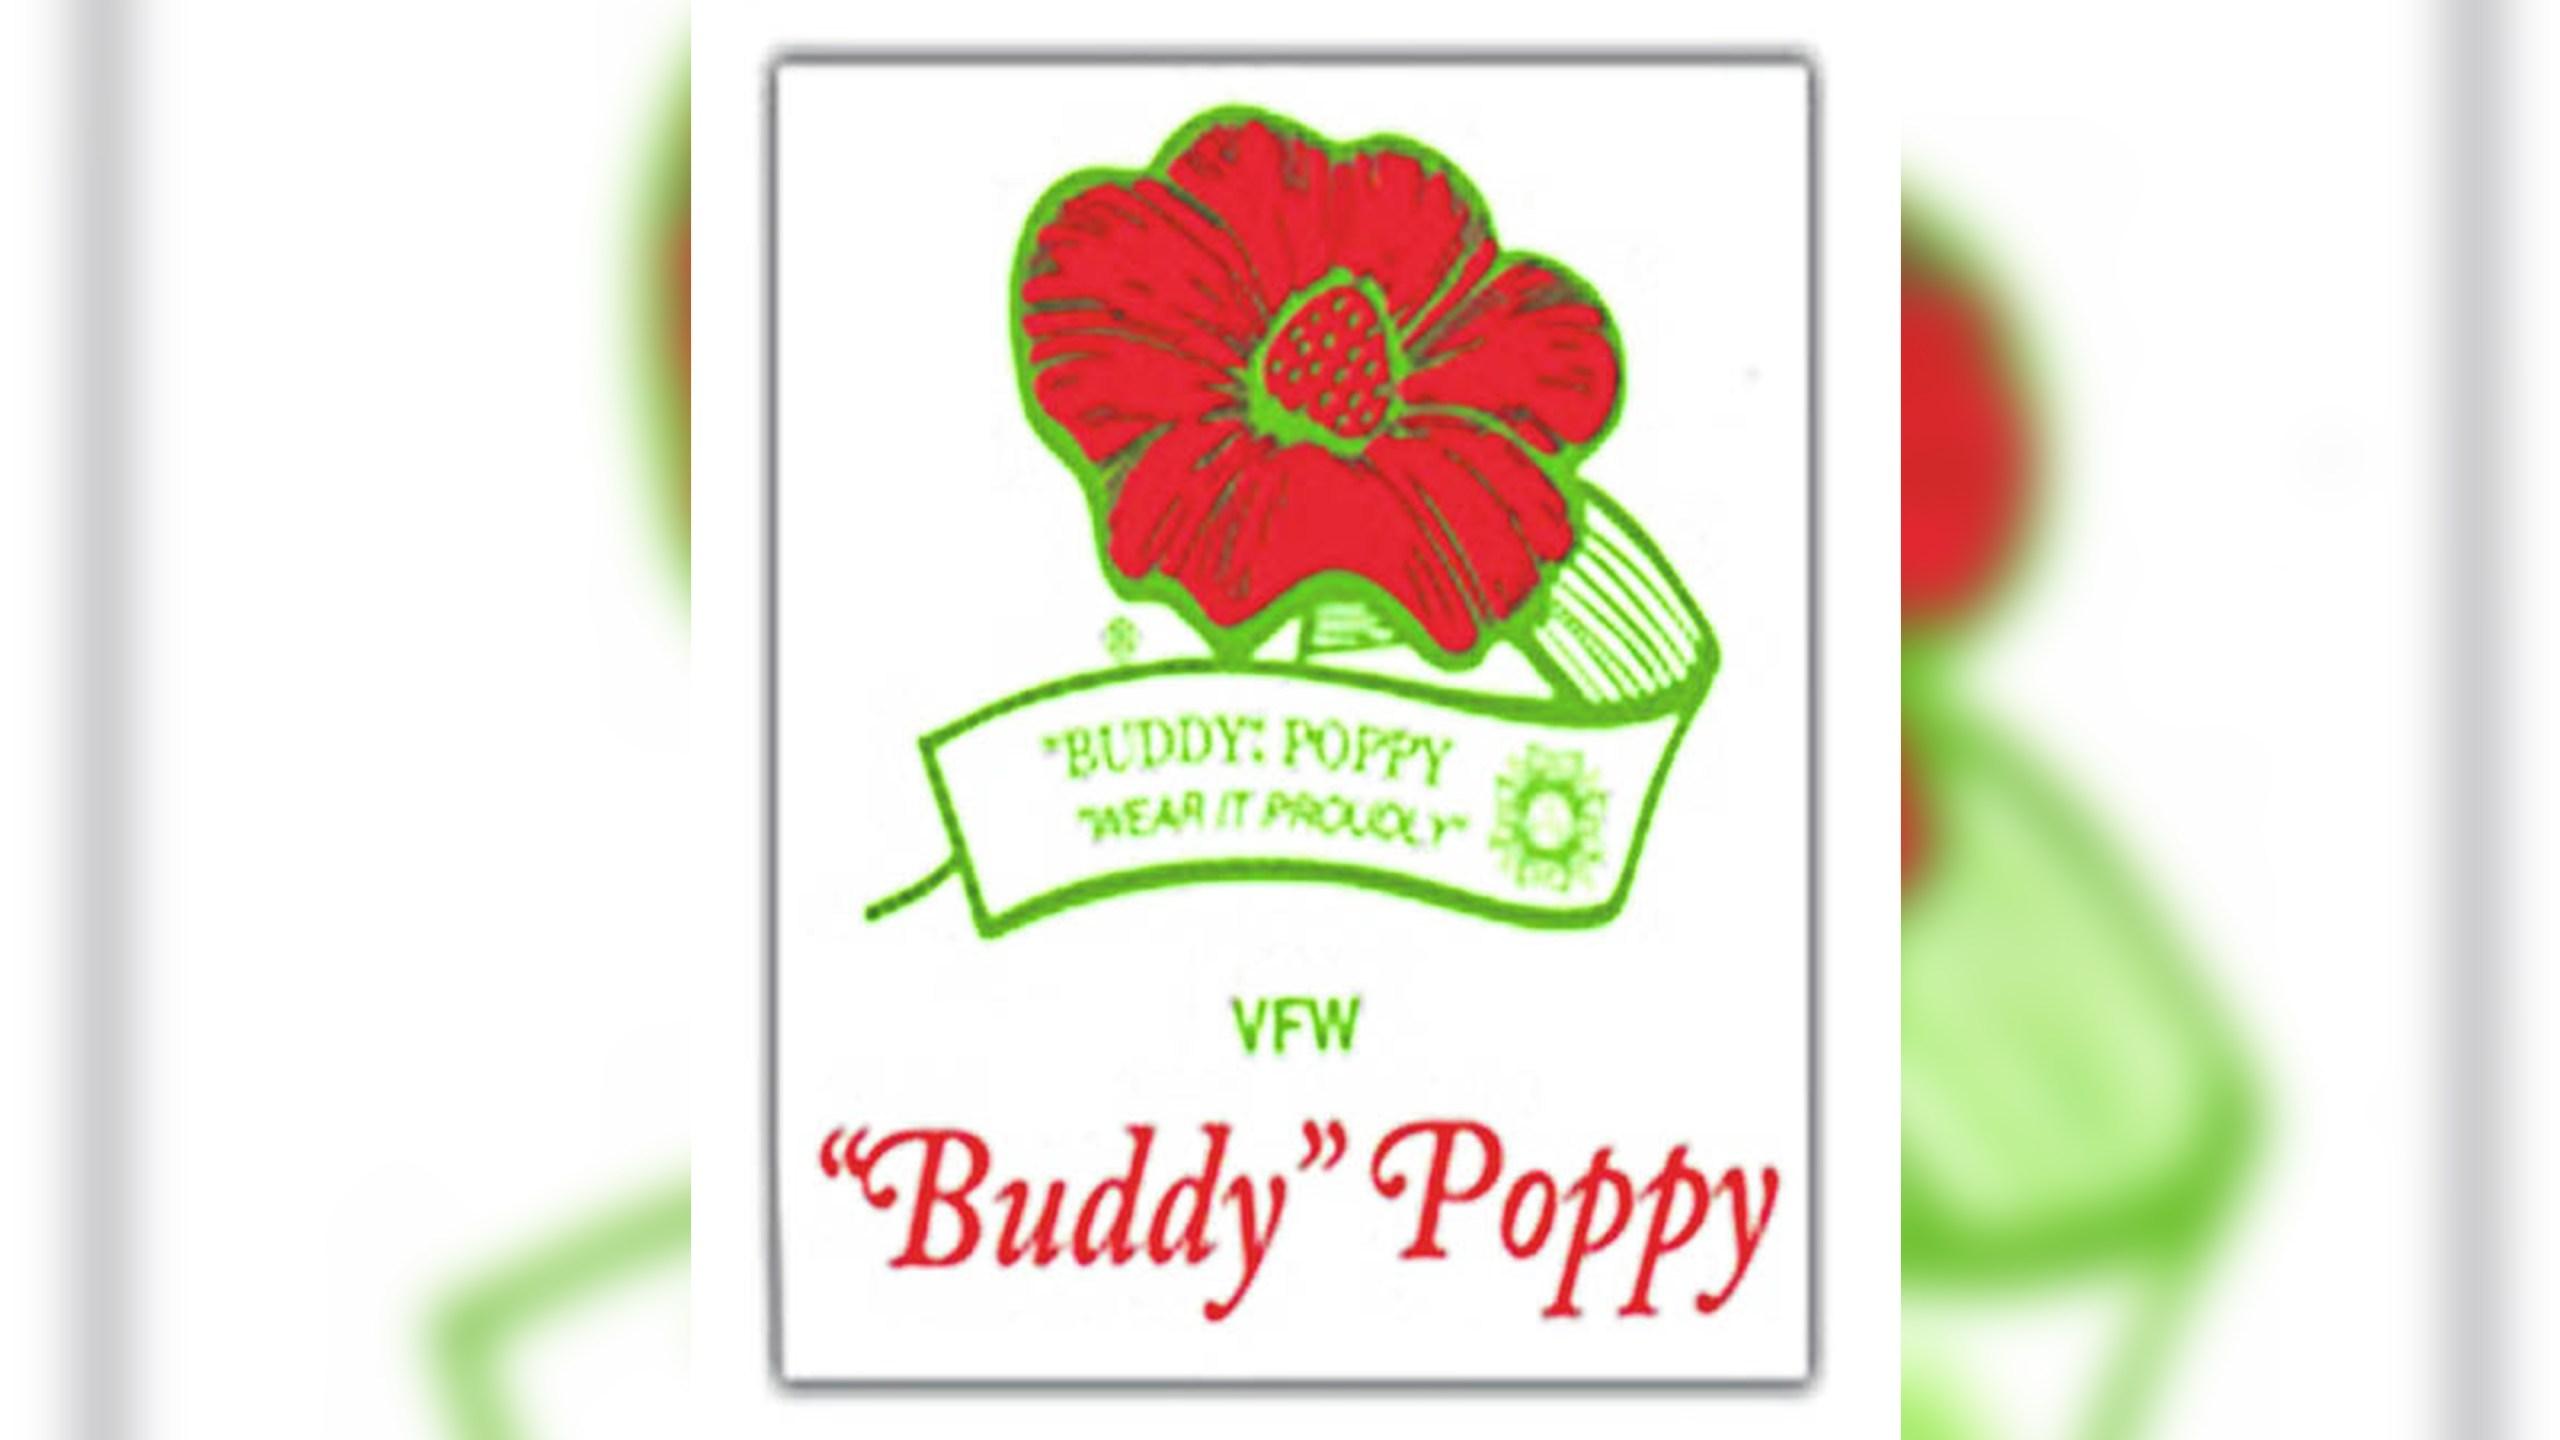 Buddy Poppy web